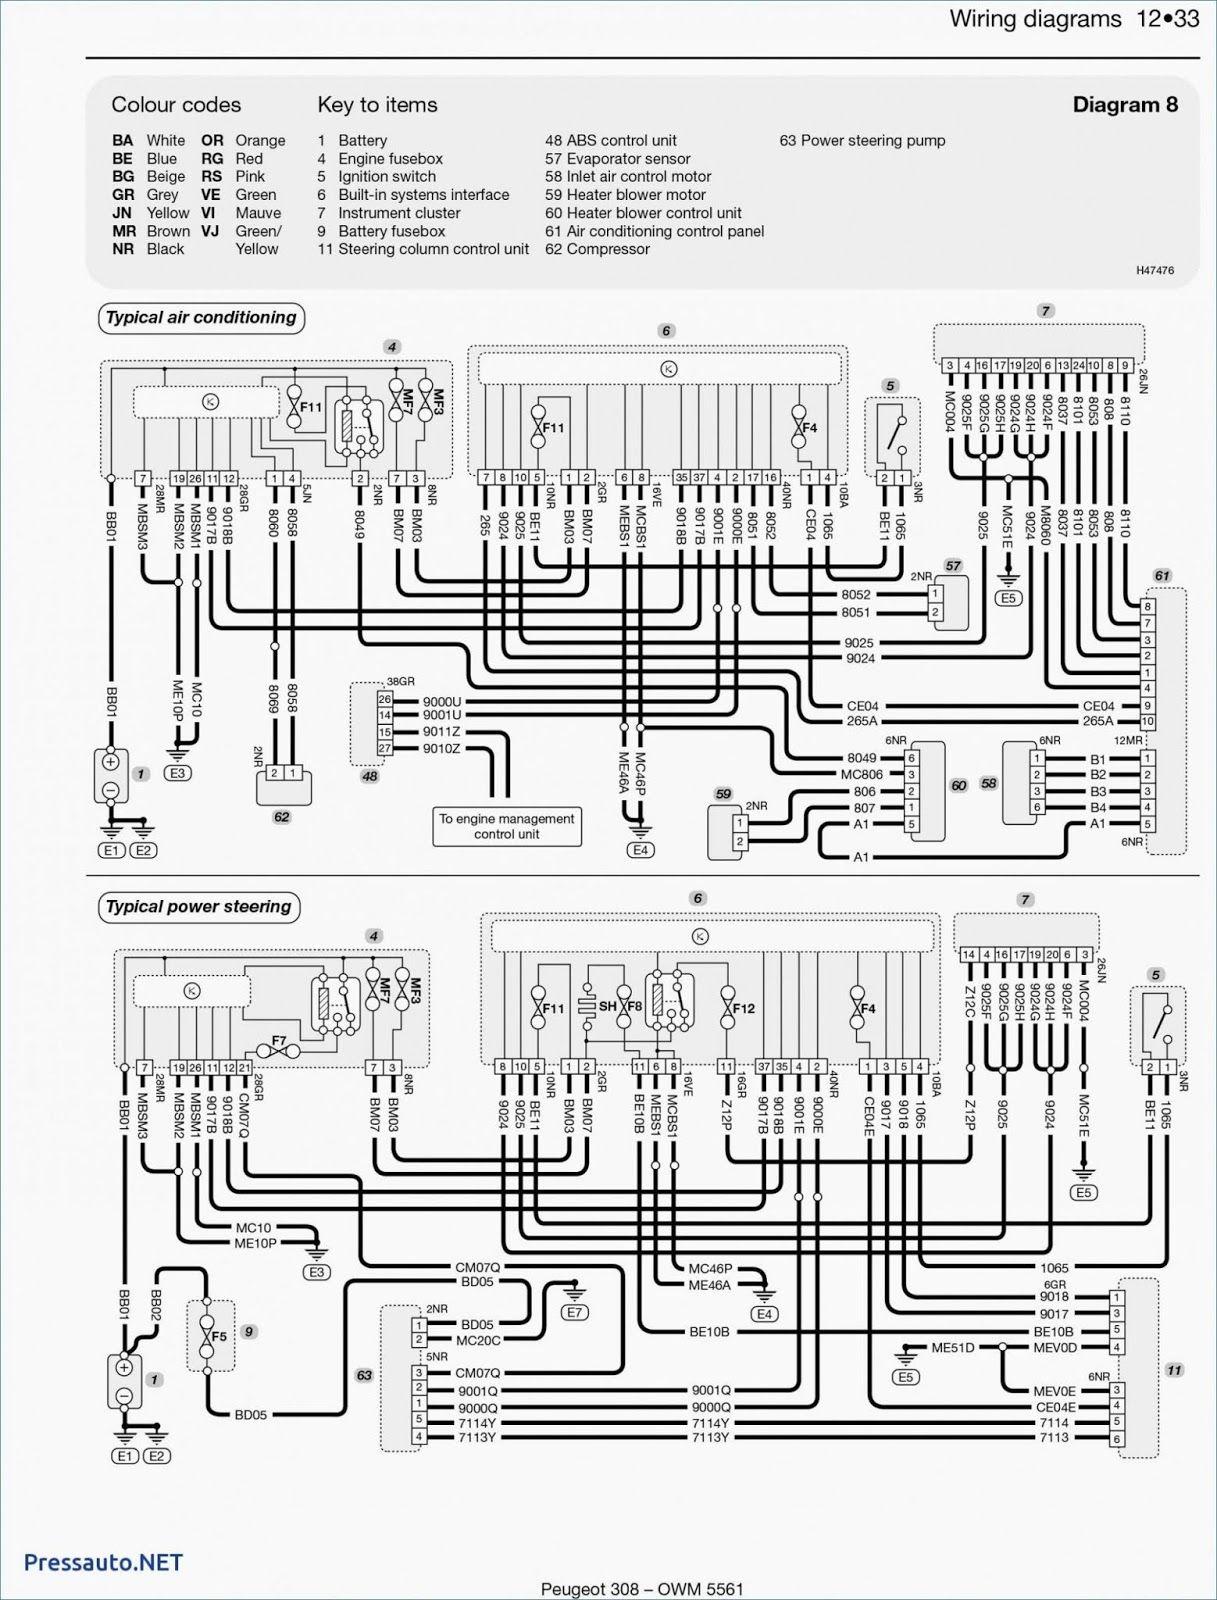 Engine Wiring Diagram Peugeot 8 Zet Peugeot Diagram Electrical Symbols